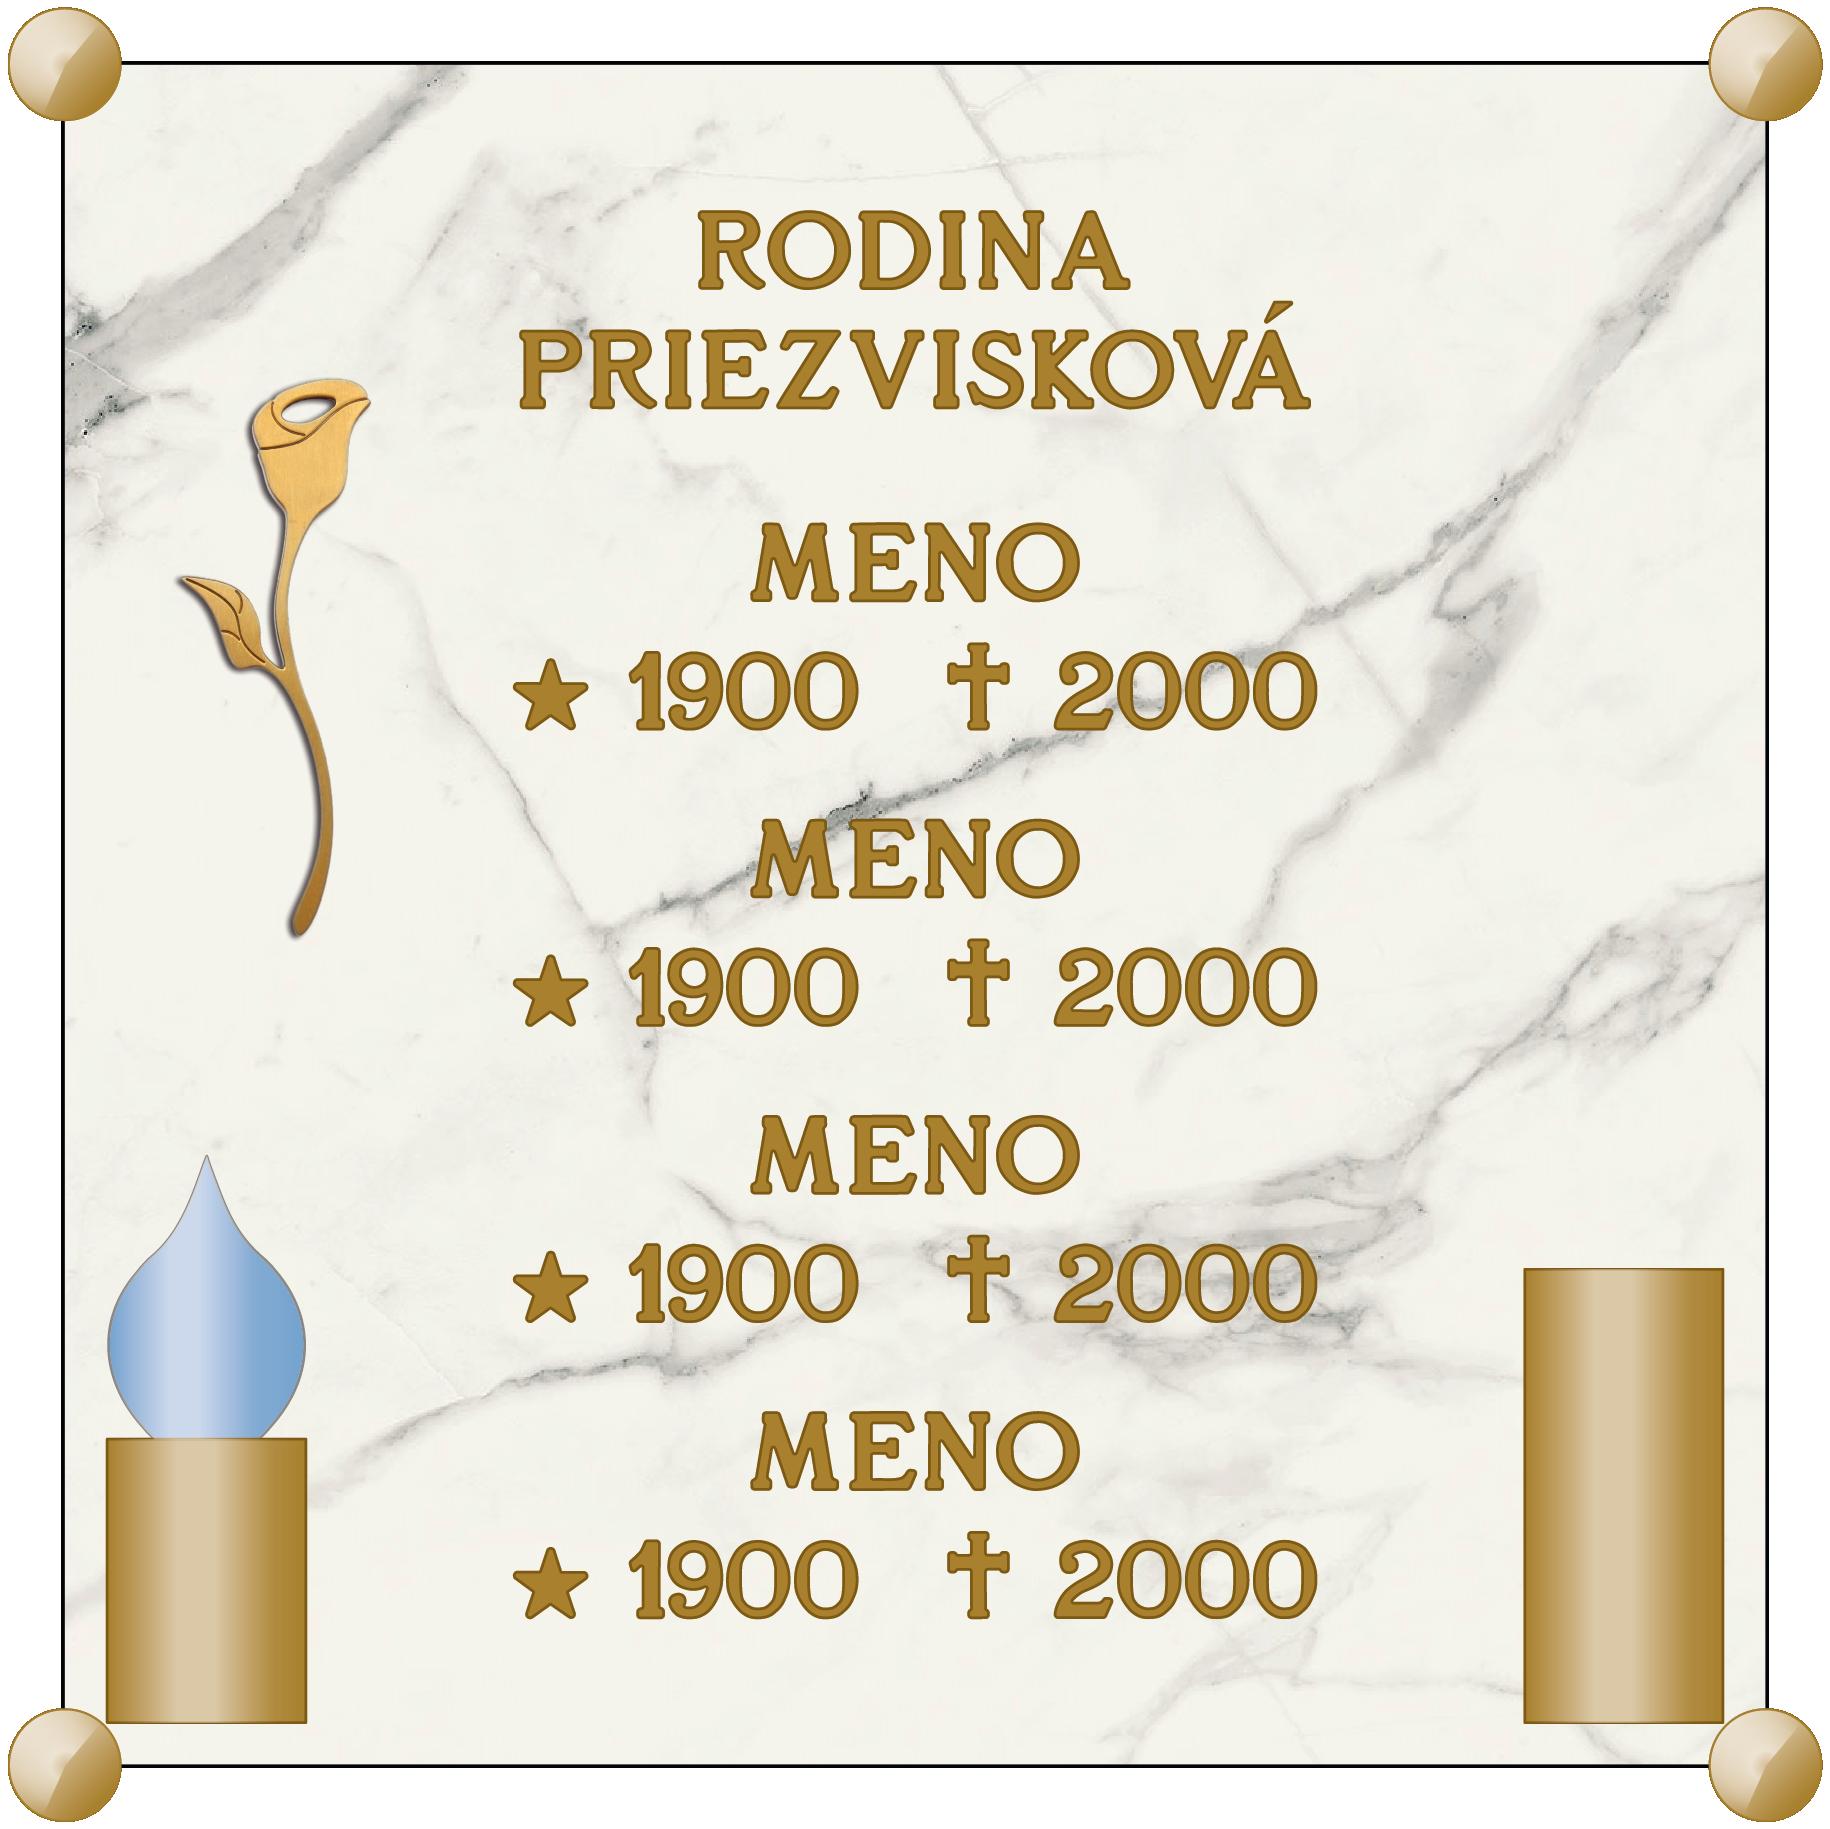 ROMANO_60x60_60x60_3c